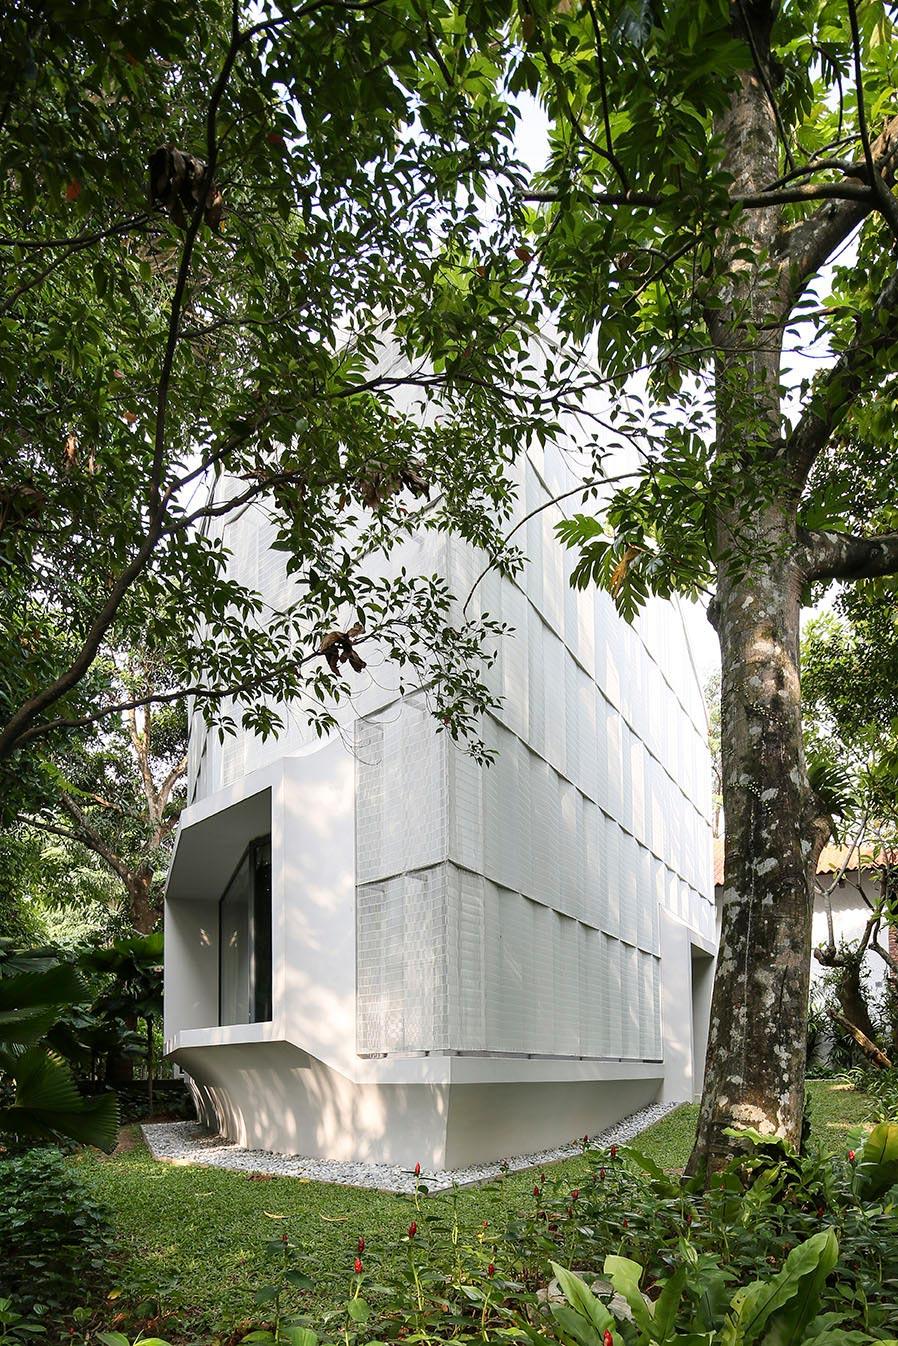 Hut House In The Holland Village Neighbourhood Of